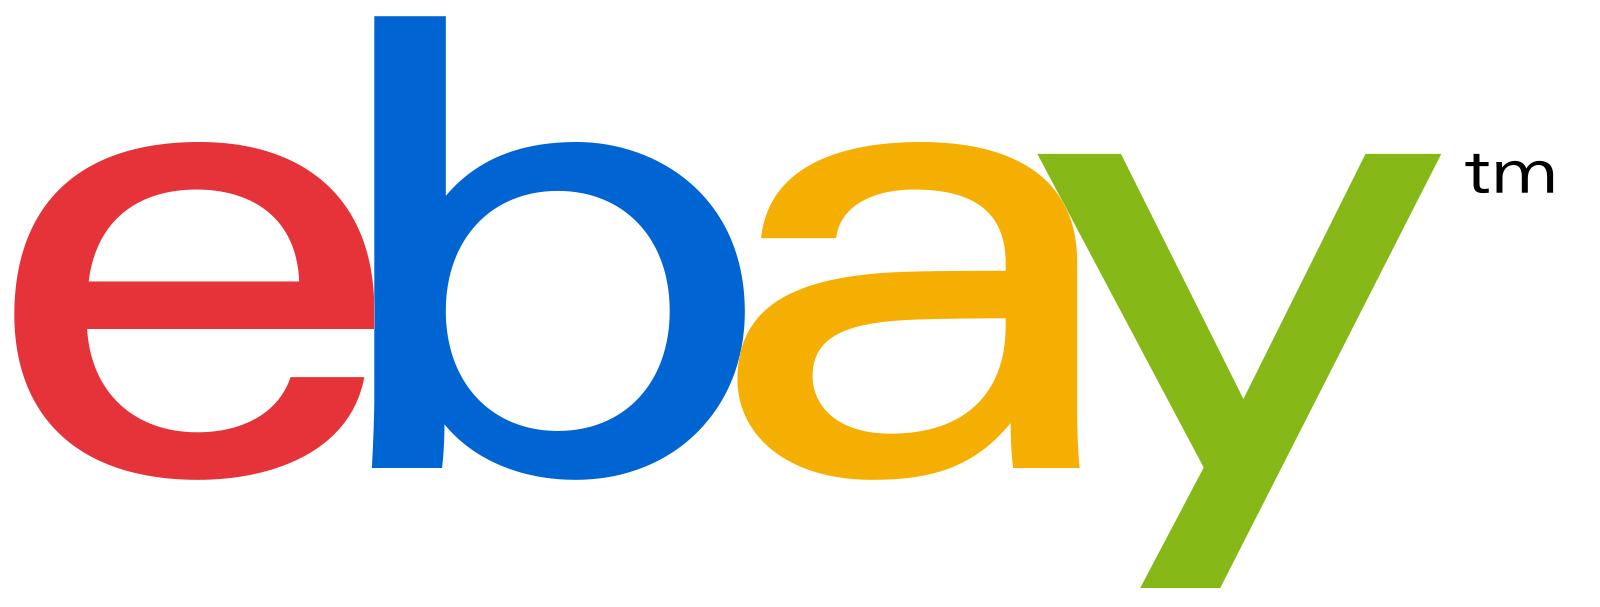 Ebay combay